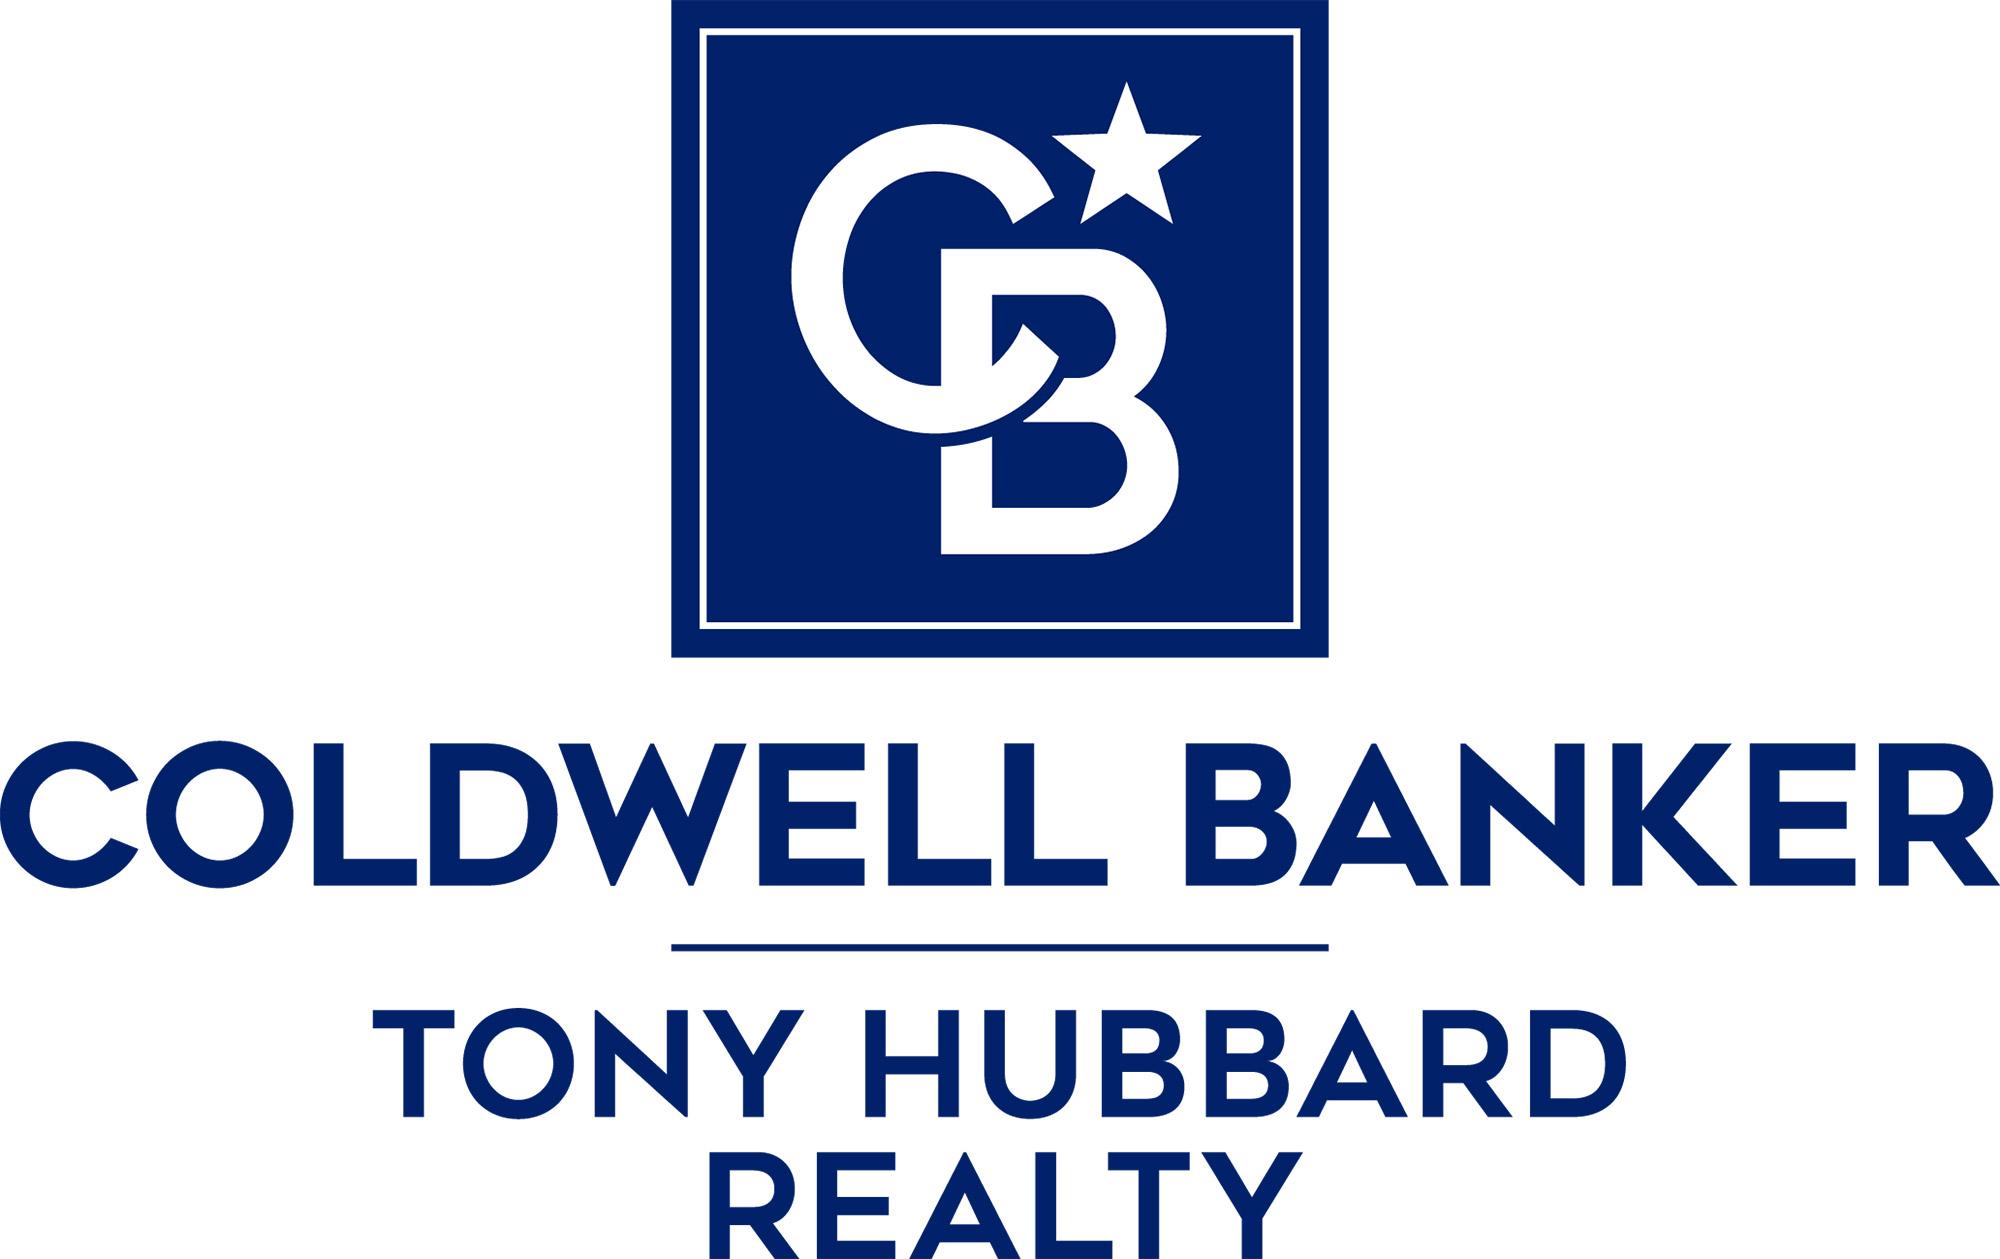 Dana Vander Meer - Coldwell Banker Tony Hubbard Logo